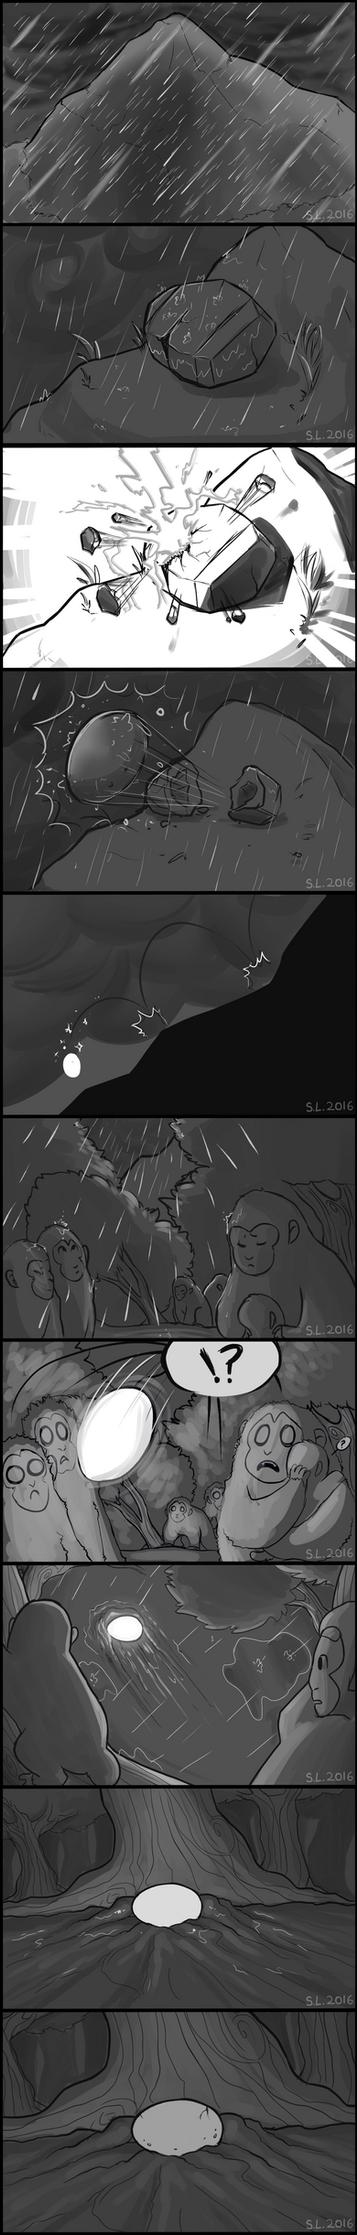 The Birth of Sun - Part One by ShadeySix